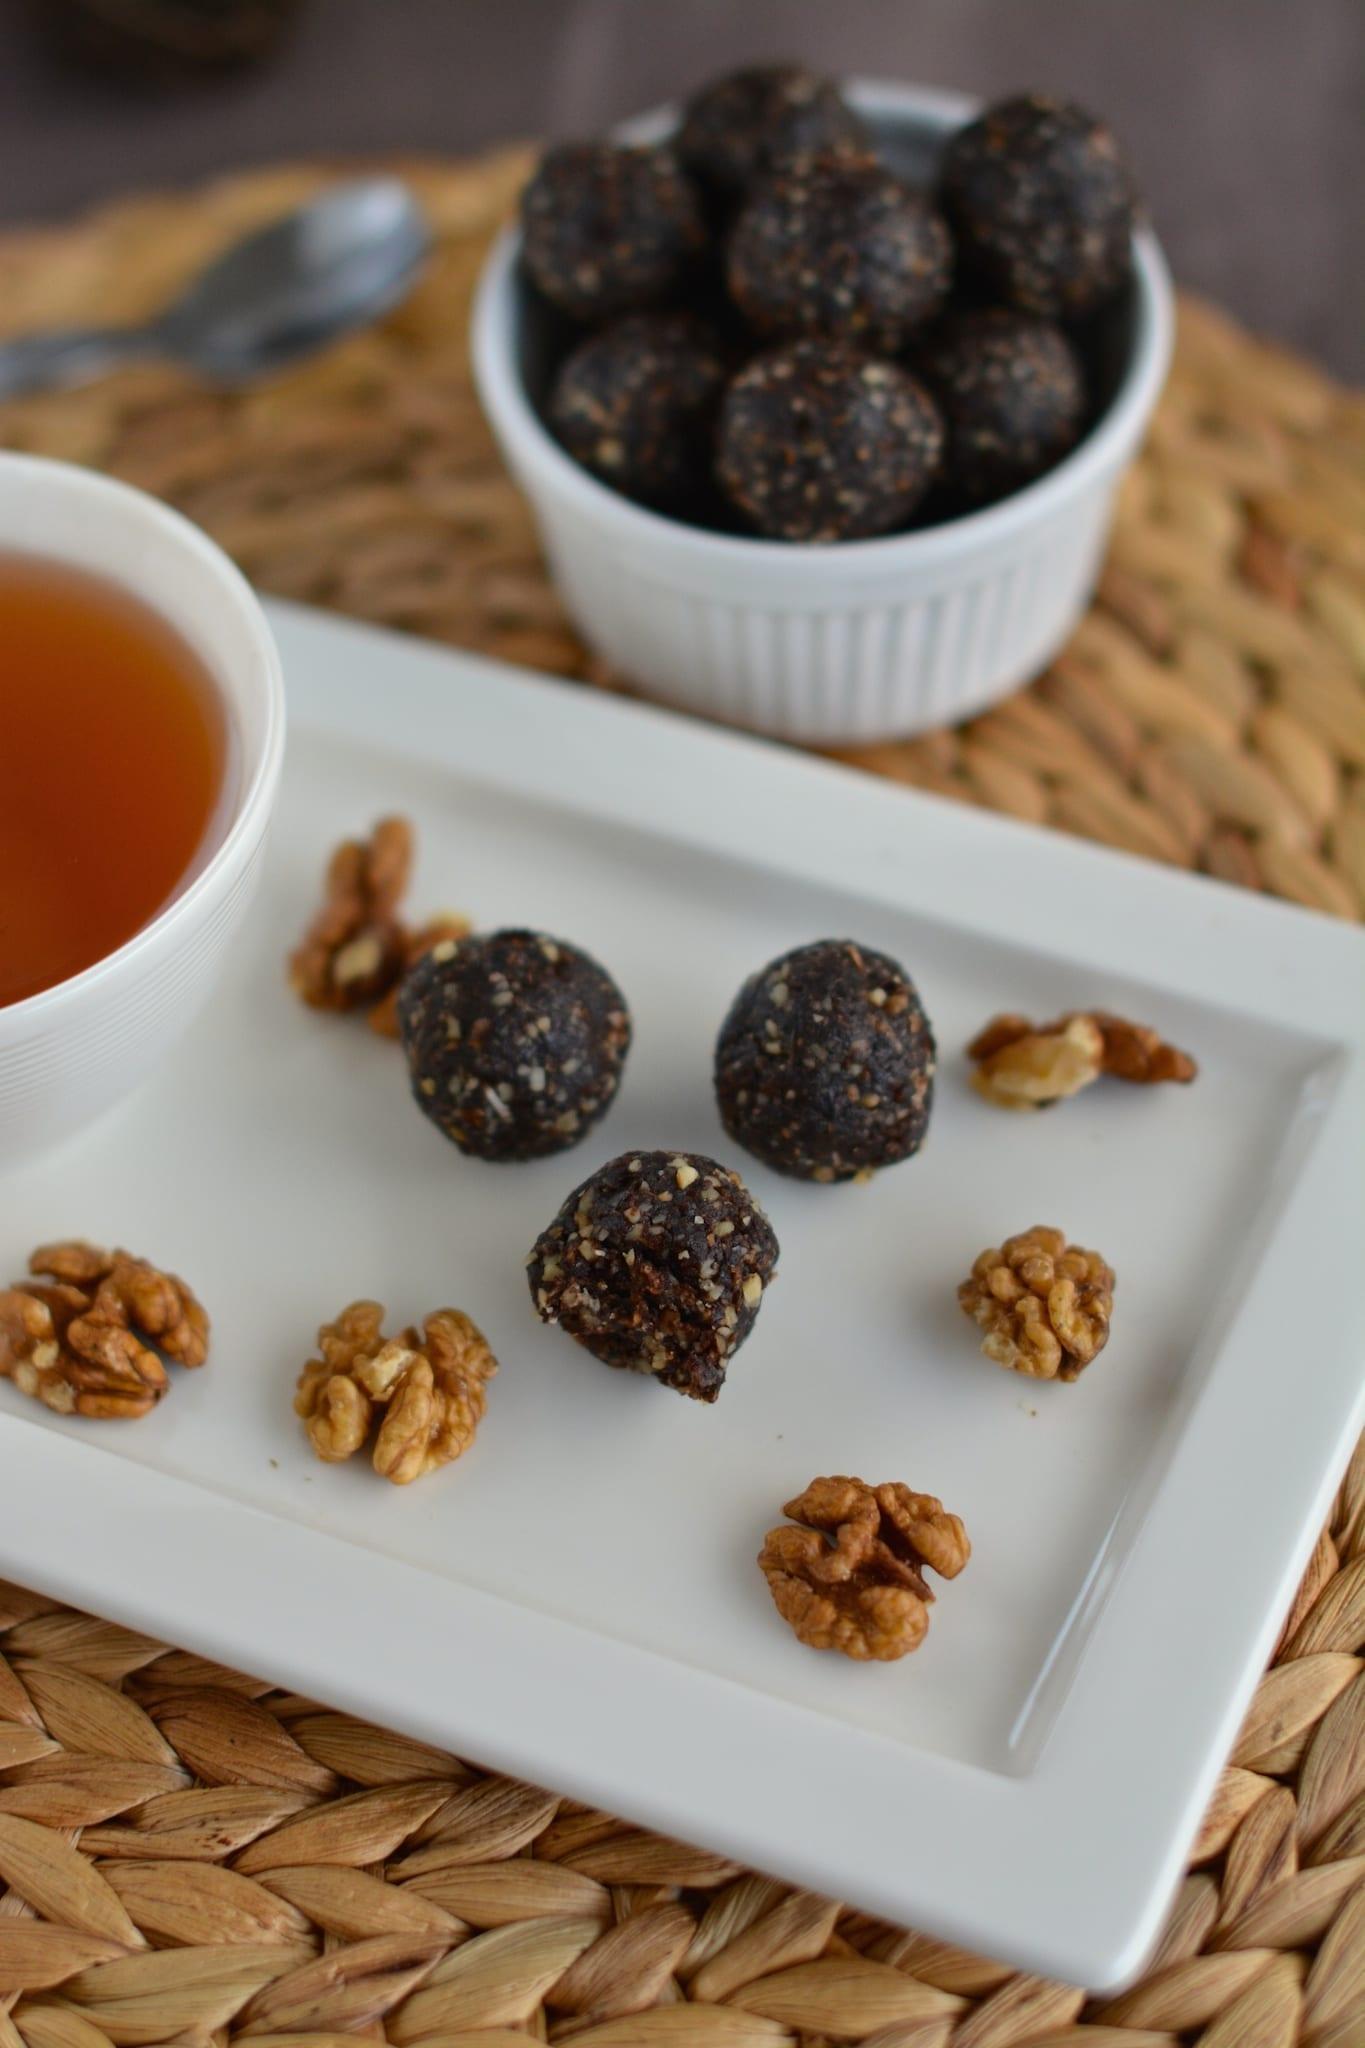 walnuts, dates, coconut, carob, candies